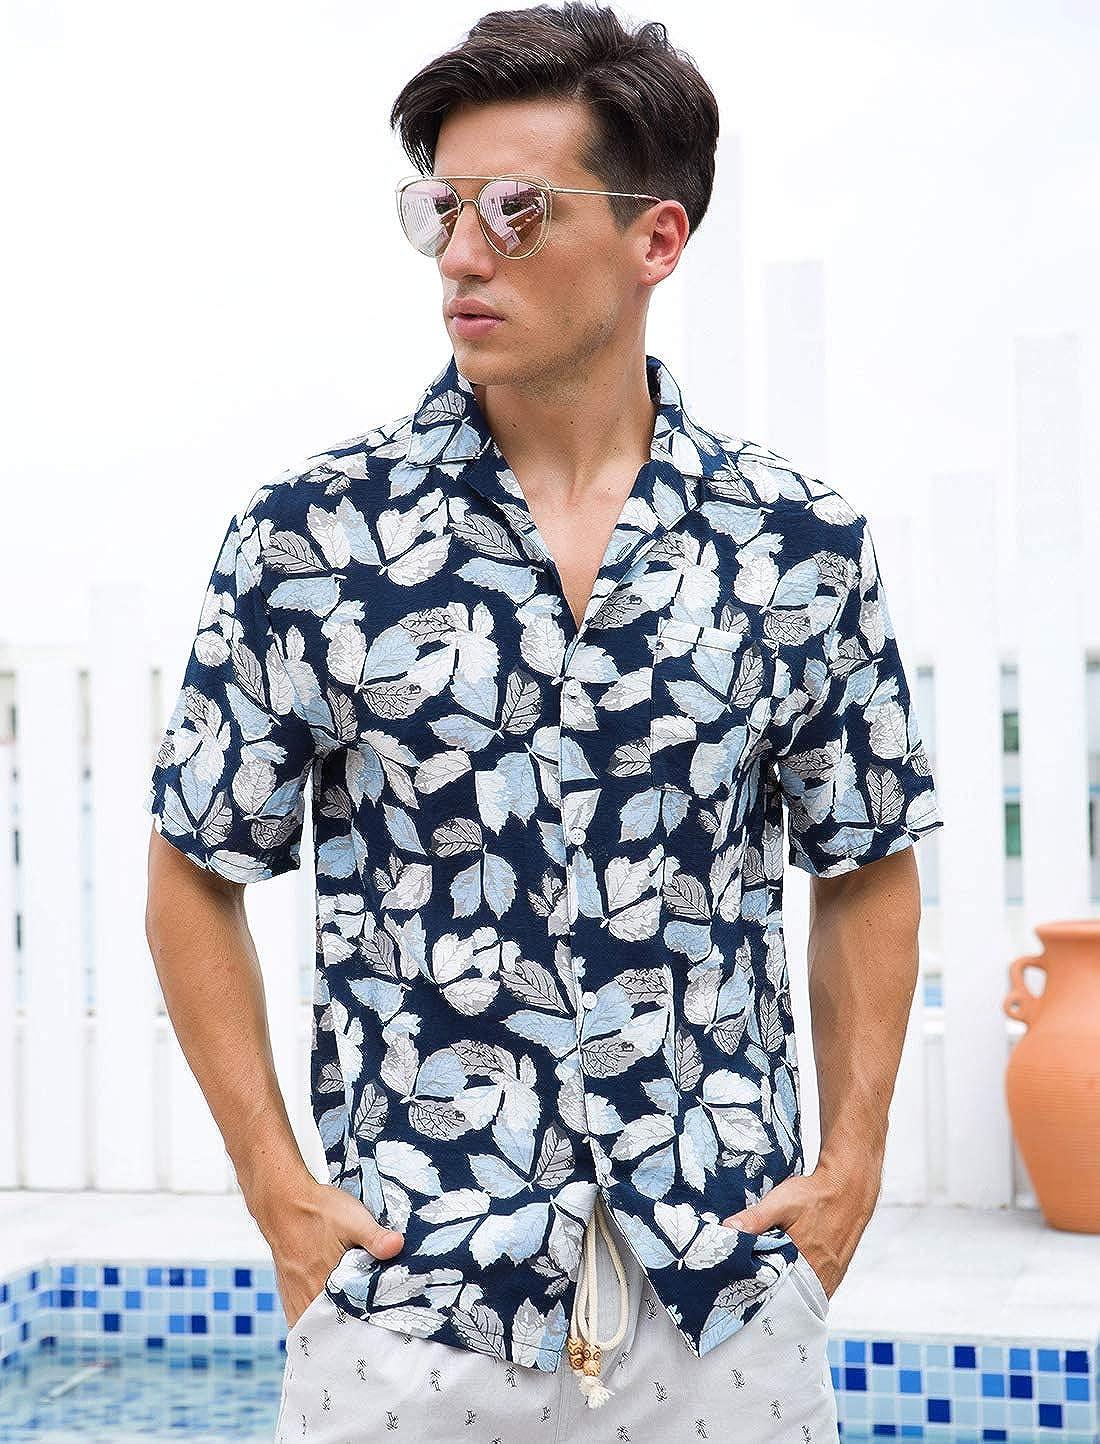 YUNY Mens Plus Size Floral Print Roll Sleeve Business Dress Shirt Navy Blue 2XL